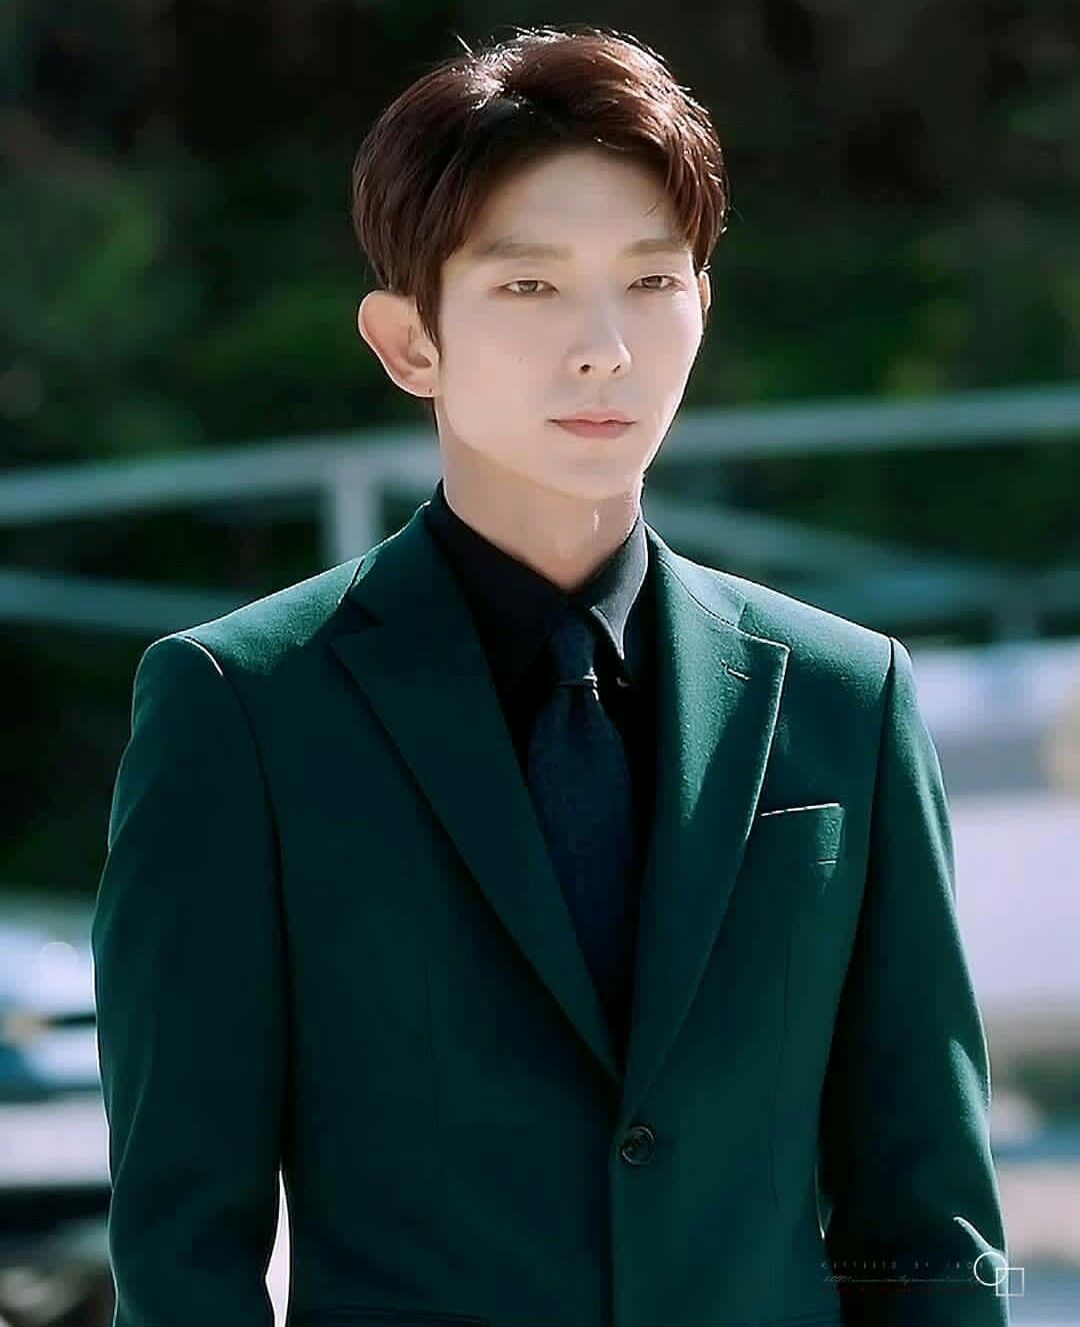 「@actor_jg Lee Joon gi ️」おしゃれまとめの人気アイデア|Pinterest|Yekojks